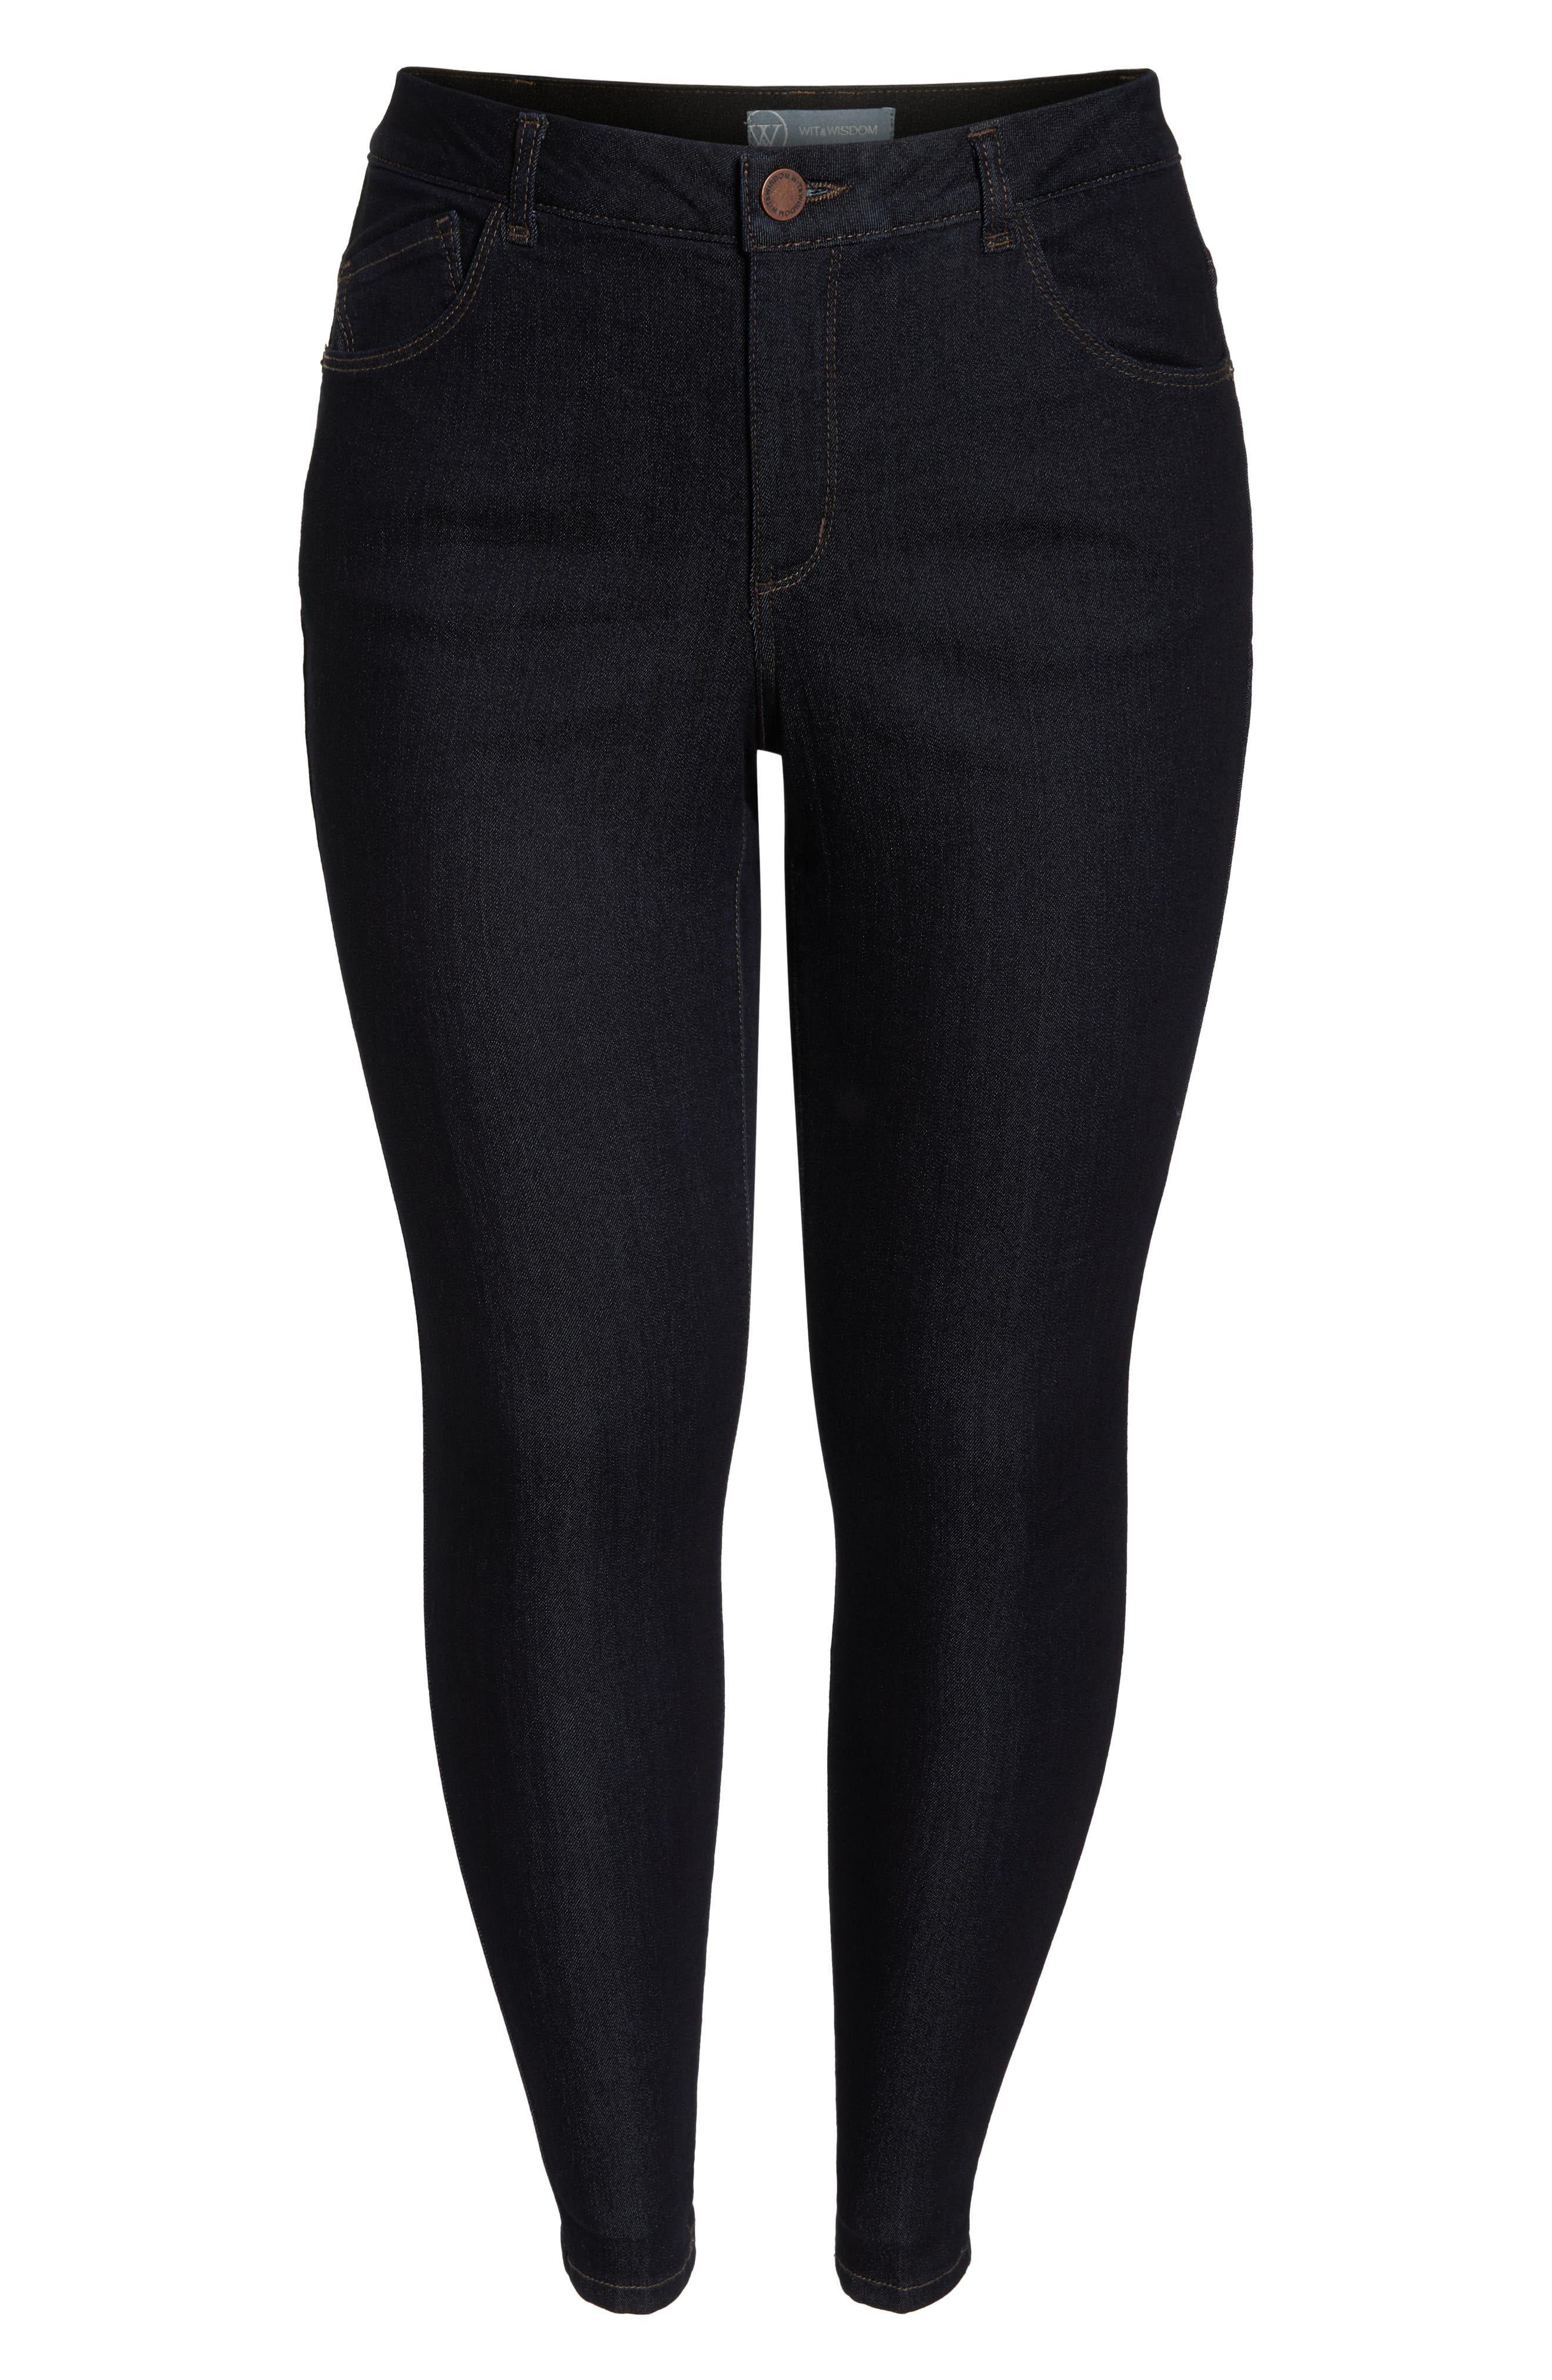 30/11 Ab-solution High Waist Skinny Jeans,                             Alternate thumbnail 6, color,                             INDIGO